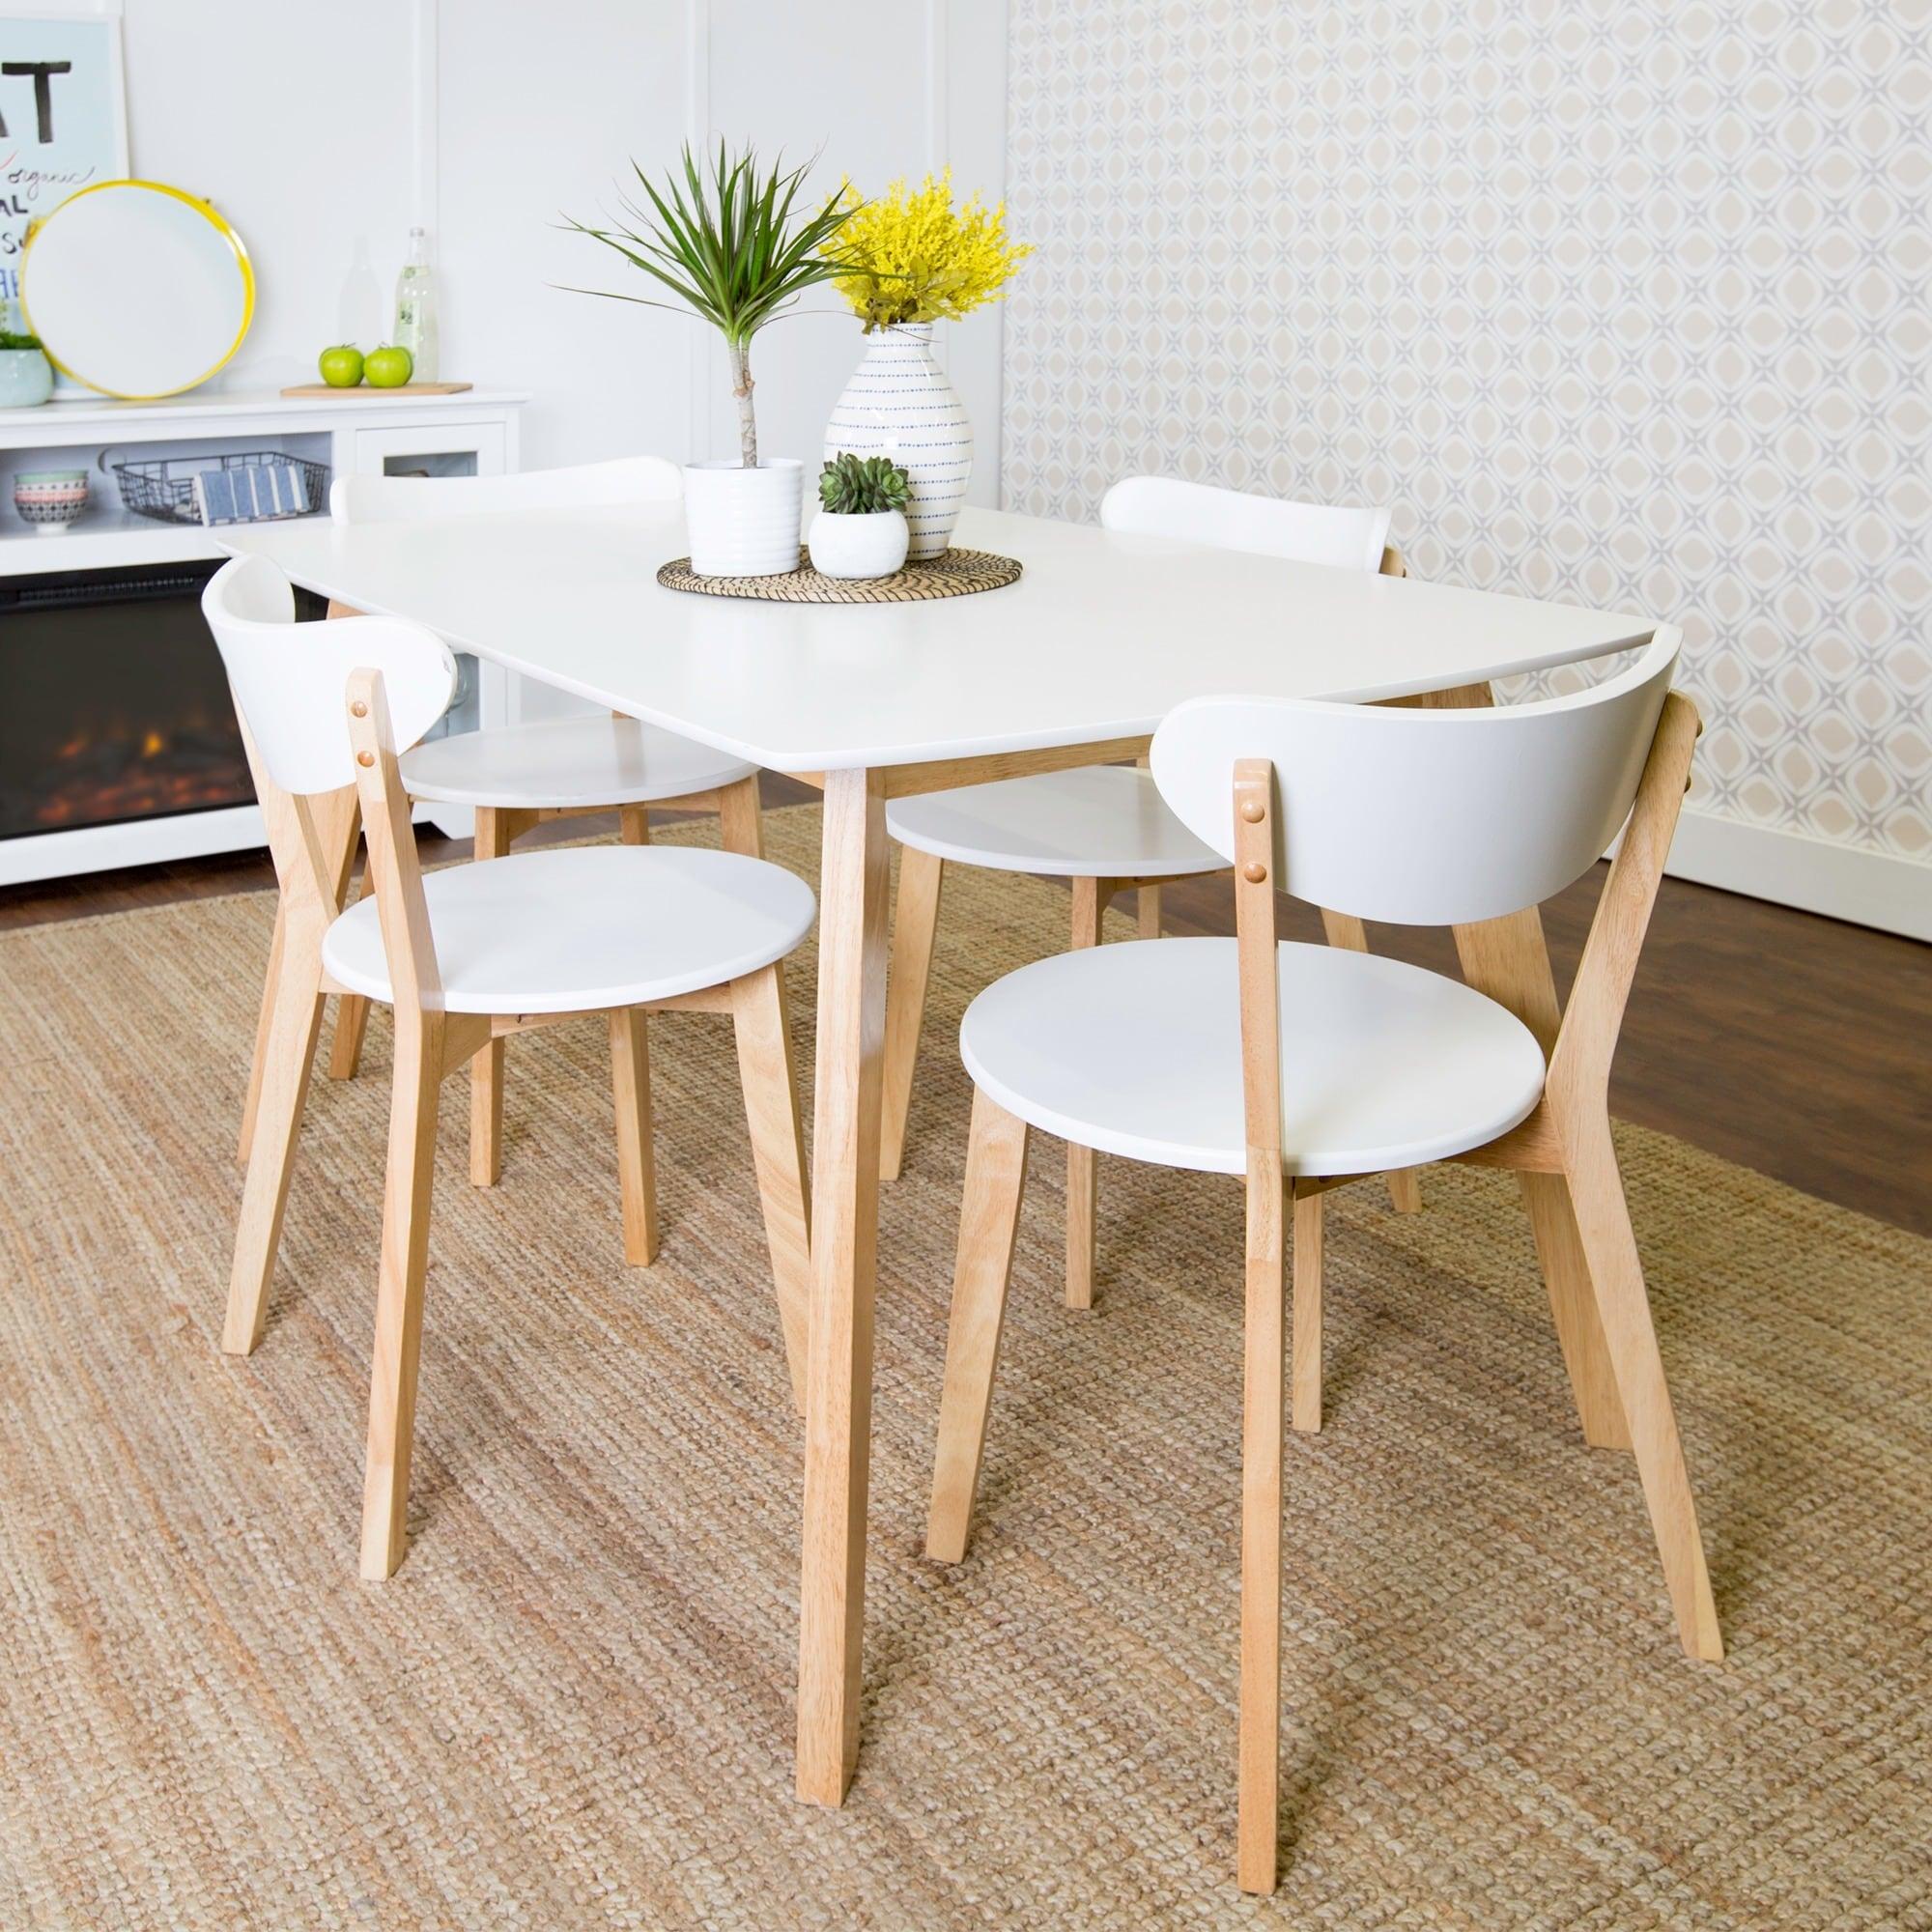 5-Piece Retro Modern Wood Dining Set (5- piece Retro Mode...